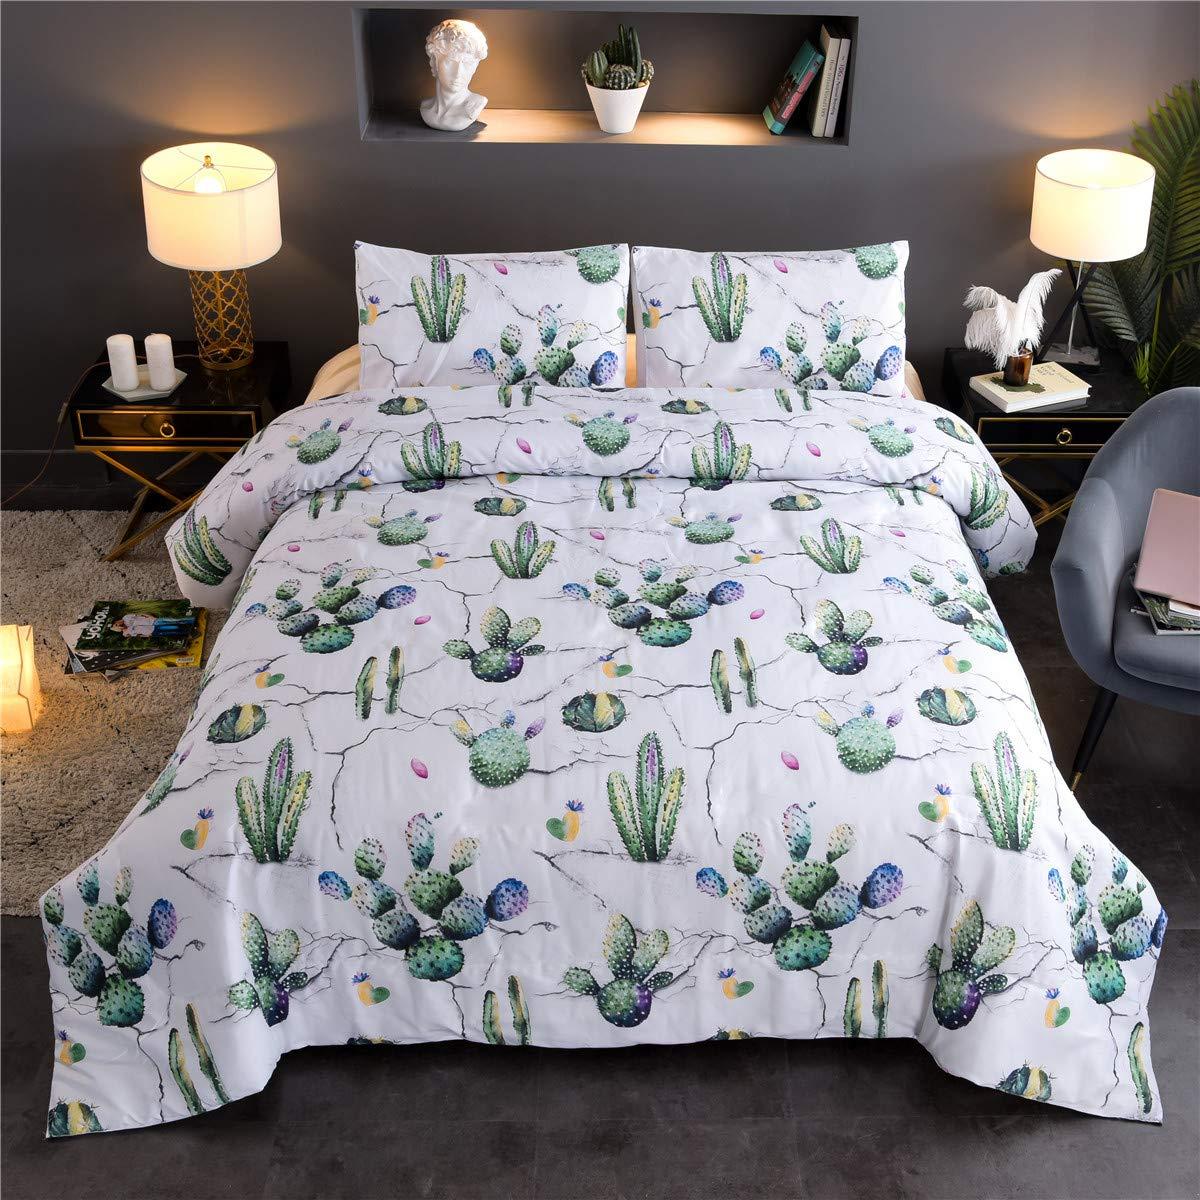 Argstar 2 Pcs Twin Cartoon Duvet Covers, 3D Cactus Bedding Set, Green Plants Down Comforter Cover, Tropical Succulent Plants Quilt Cover, 100% Microfiber, 1 Duvet Cover and 1 Pillow Sham